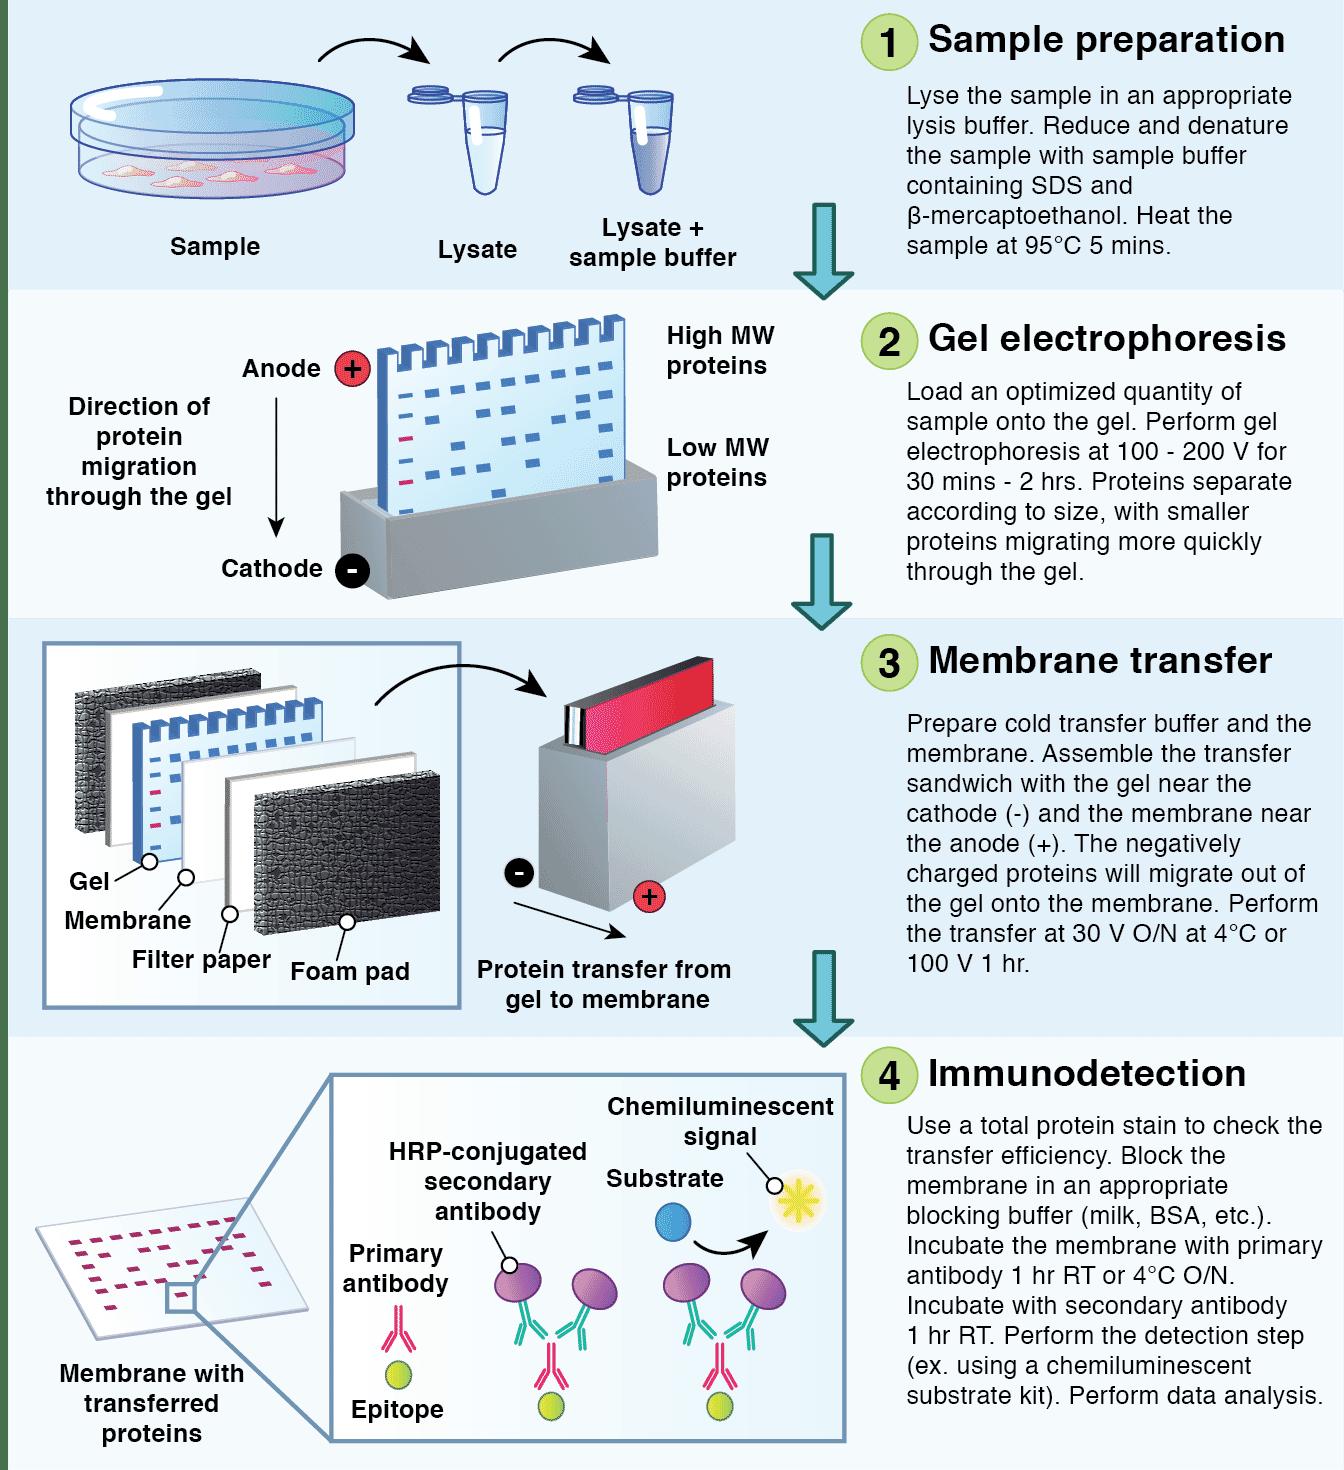 Western Blot Protocol